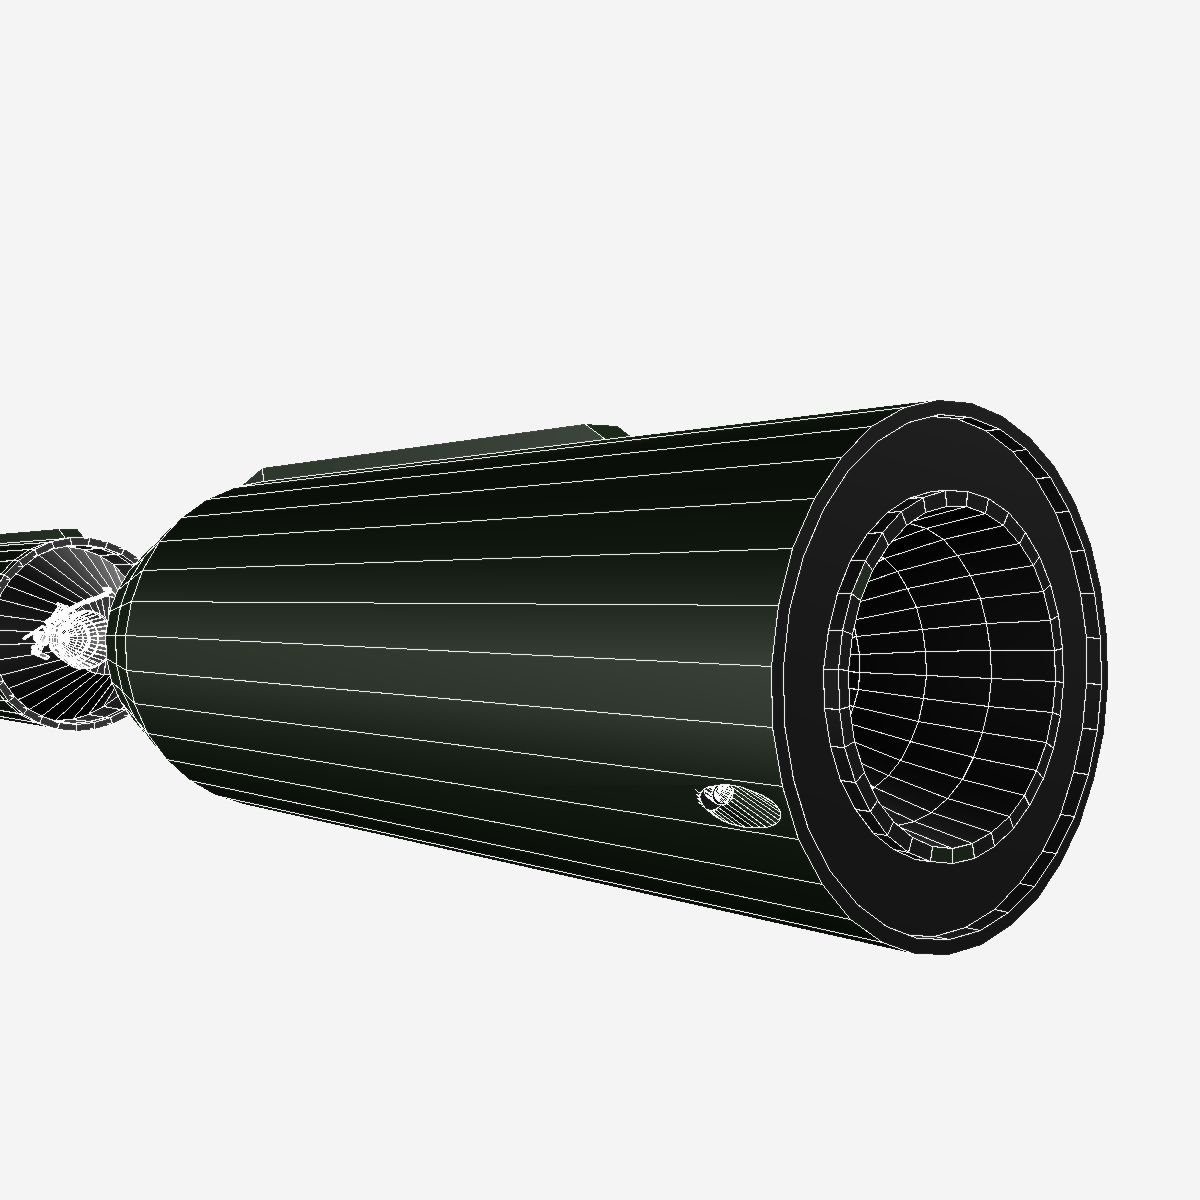 dprk kn-08 no dong-c пуужин 3d загвар 3ds dxf cob x obj 151633